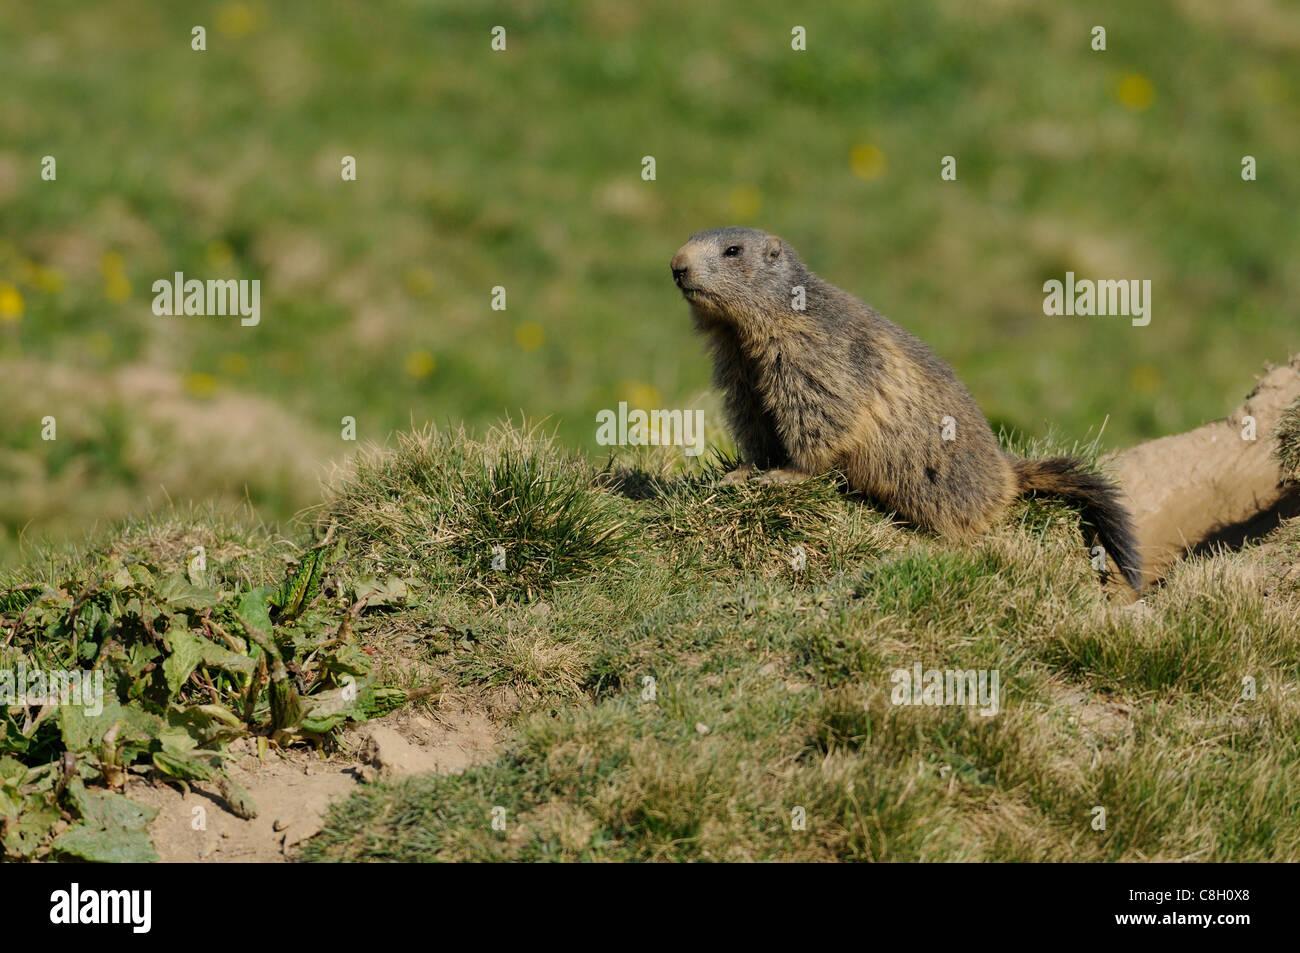 Alpine Marmot, Marmot, Marmota marmota, Sciuridae, animal, rodent, Alps, Alp Präz, Heinzenberg, canton, Grisons, - Stock Image